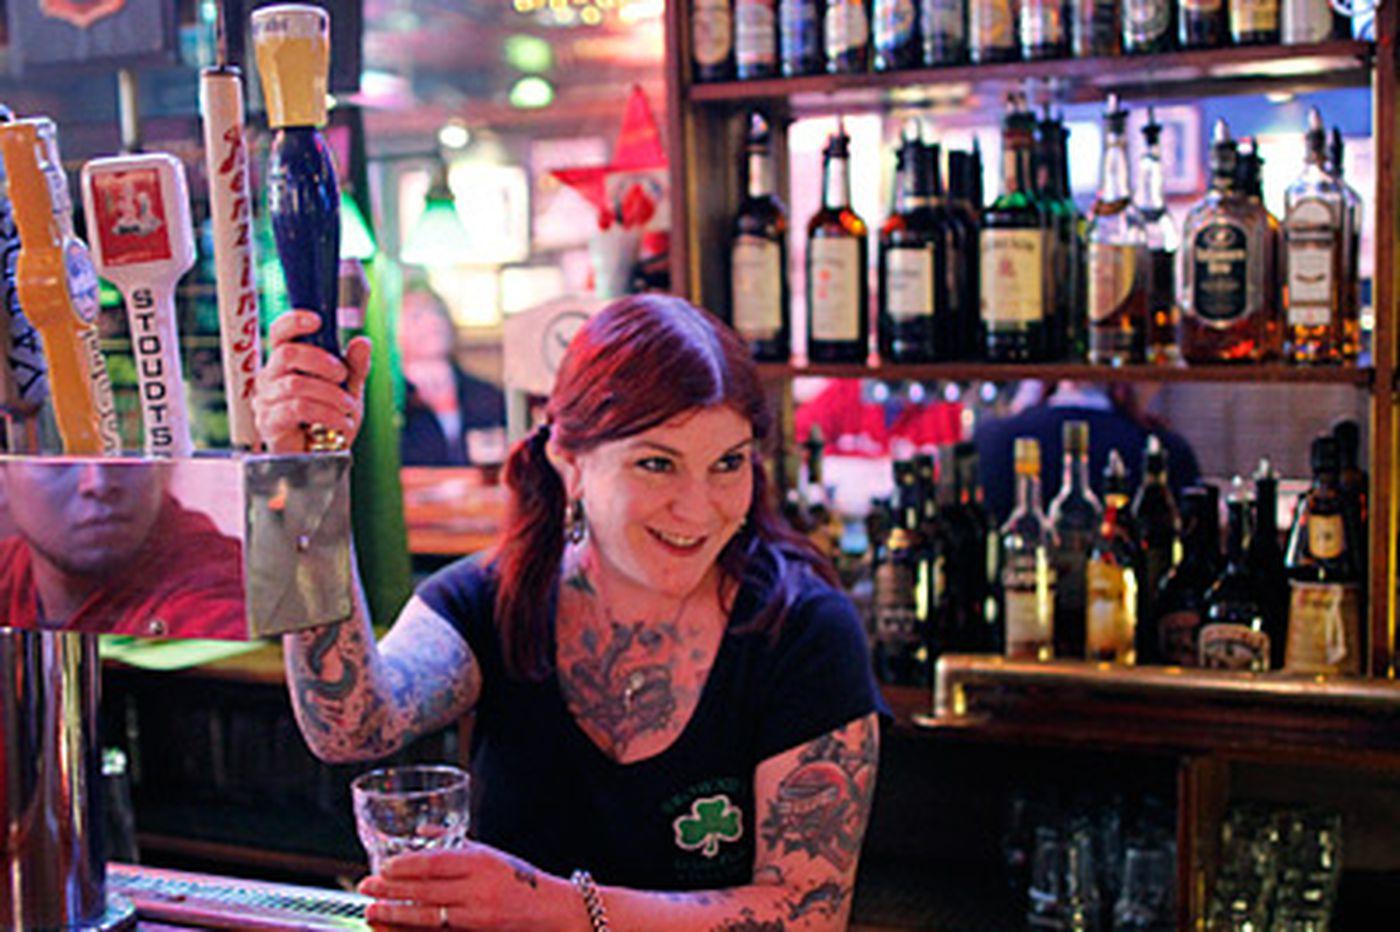 4 a.m. bar closings proposed to stem 'brain drain' in Pa.